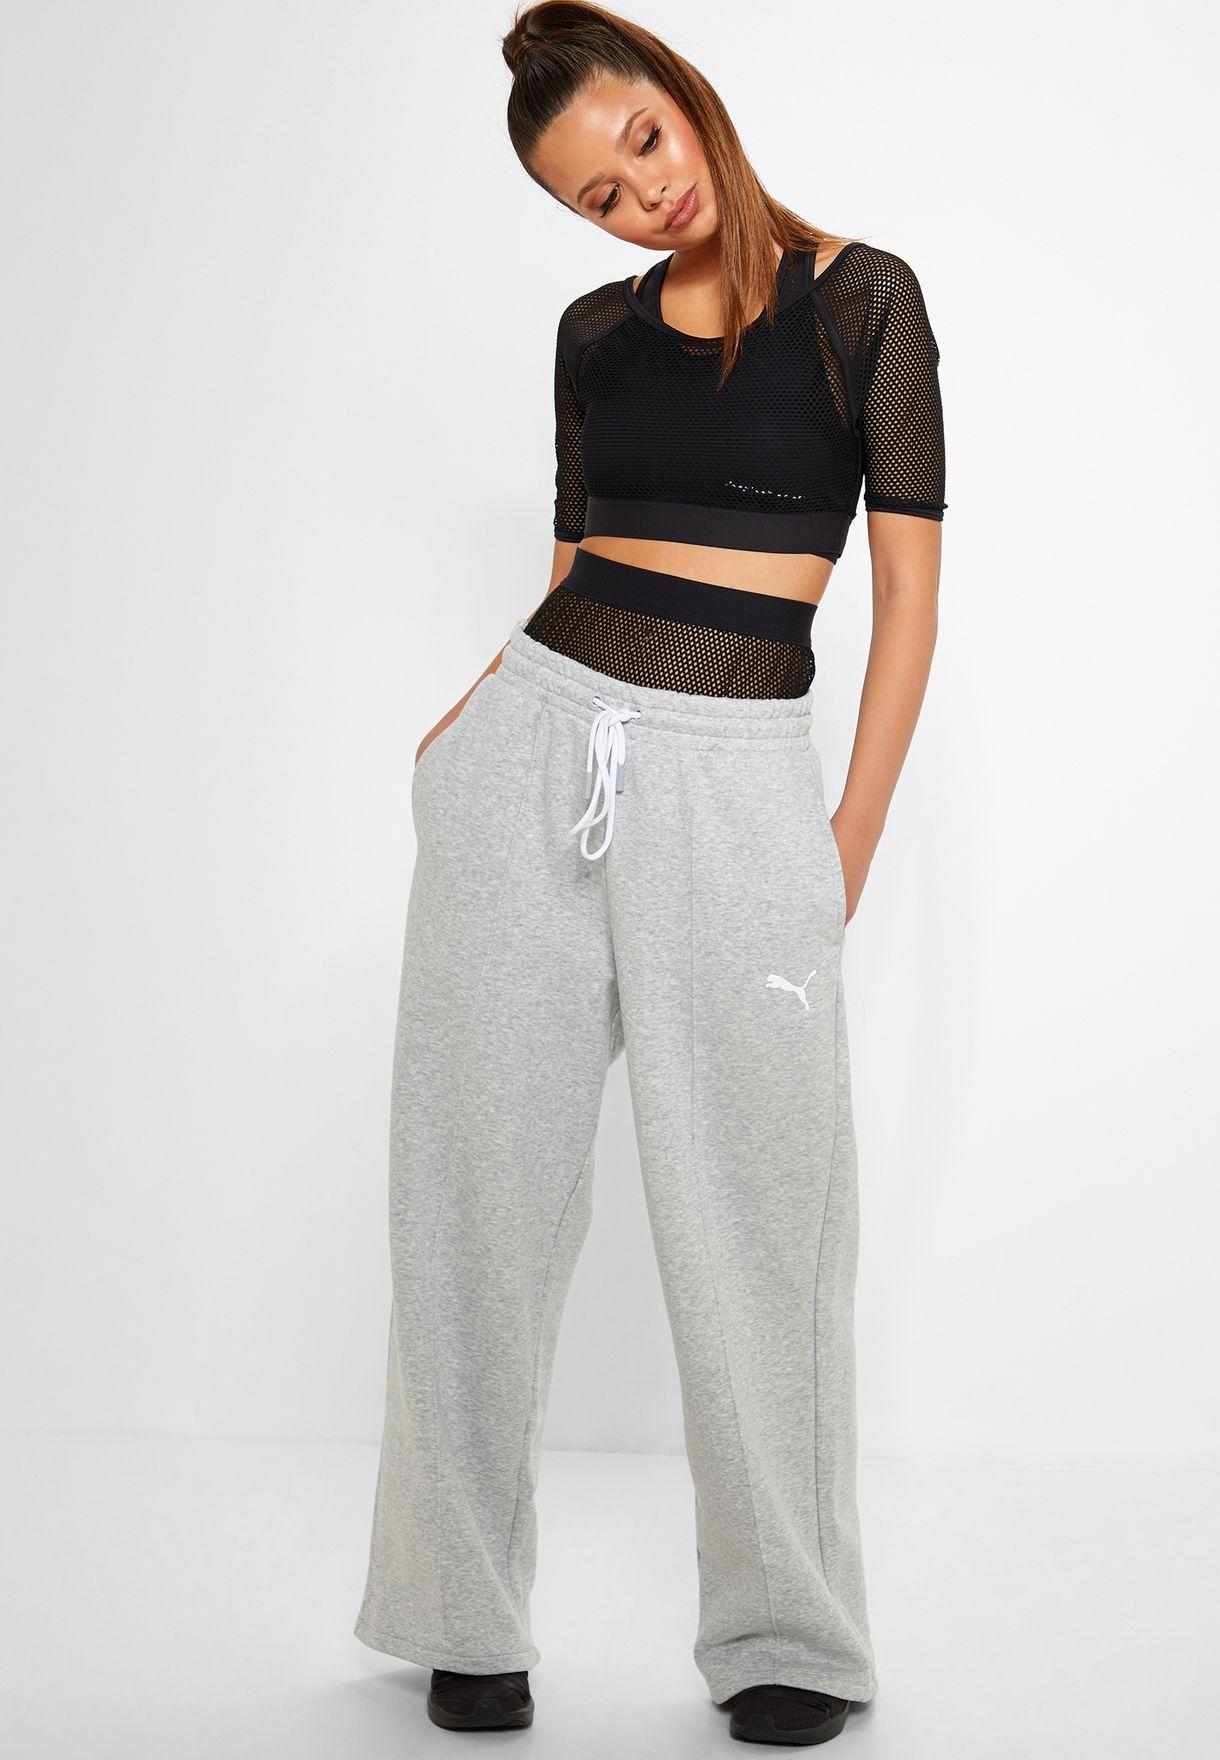 fb14aea3ad47 Shop PUMA grey Selena Gomez Sweatpants 51780101 for Women in Bahrain ...